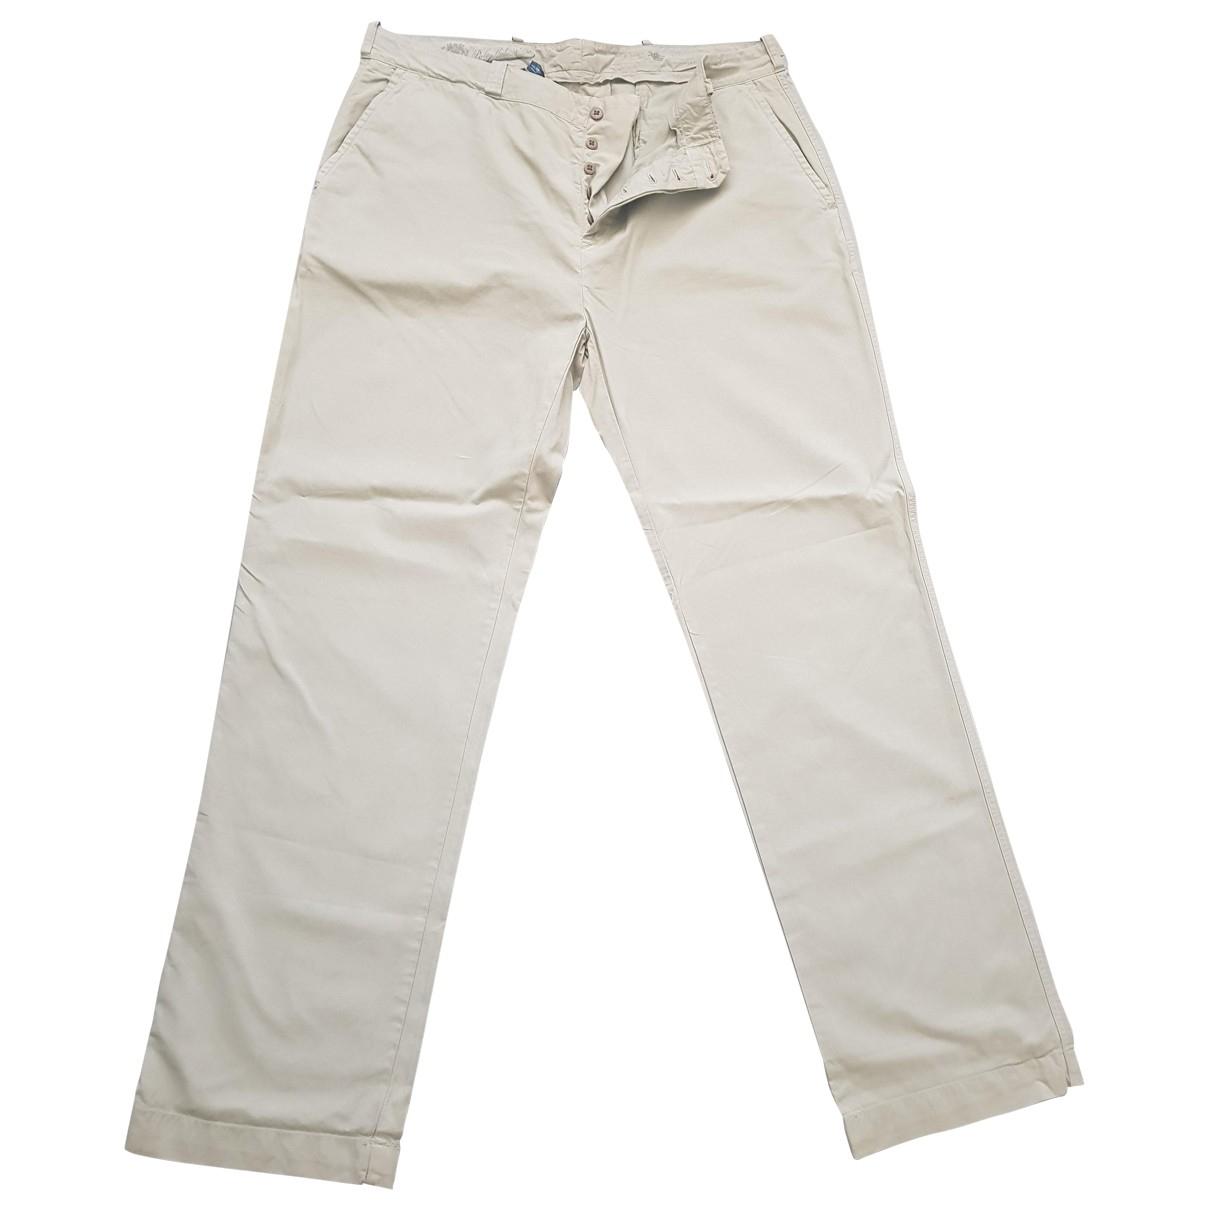 Pantalones en Algodon Caqui Polo Ralph Lauren